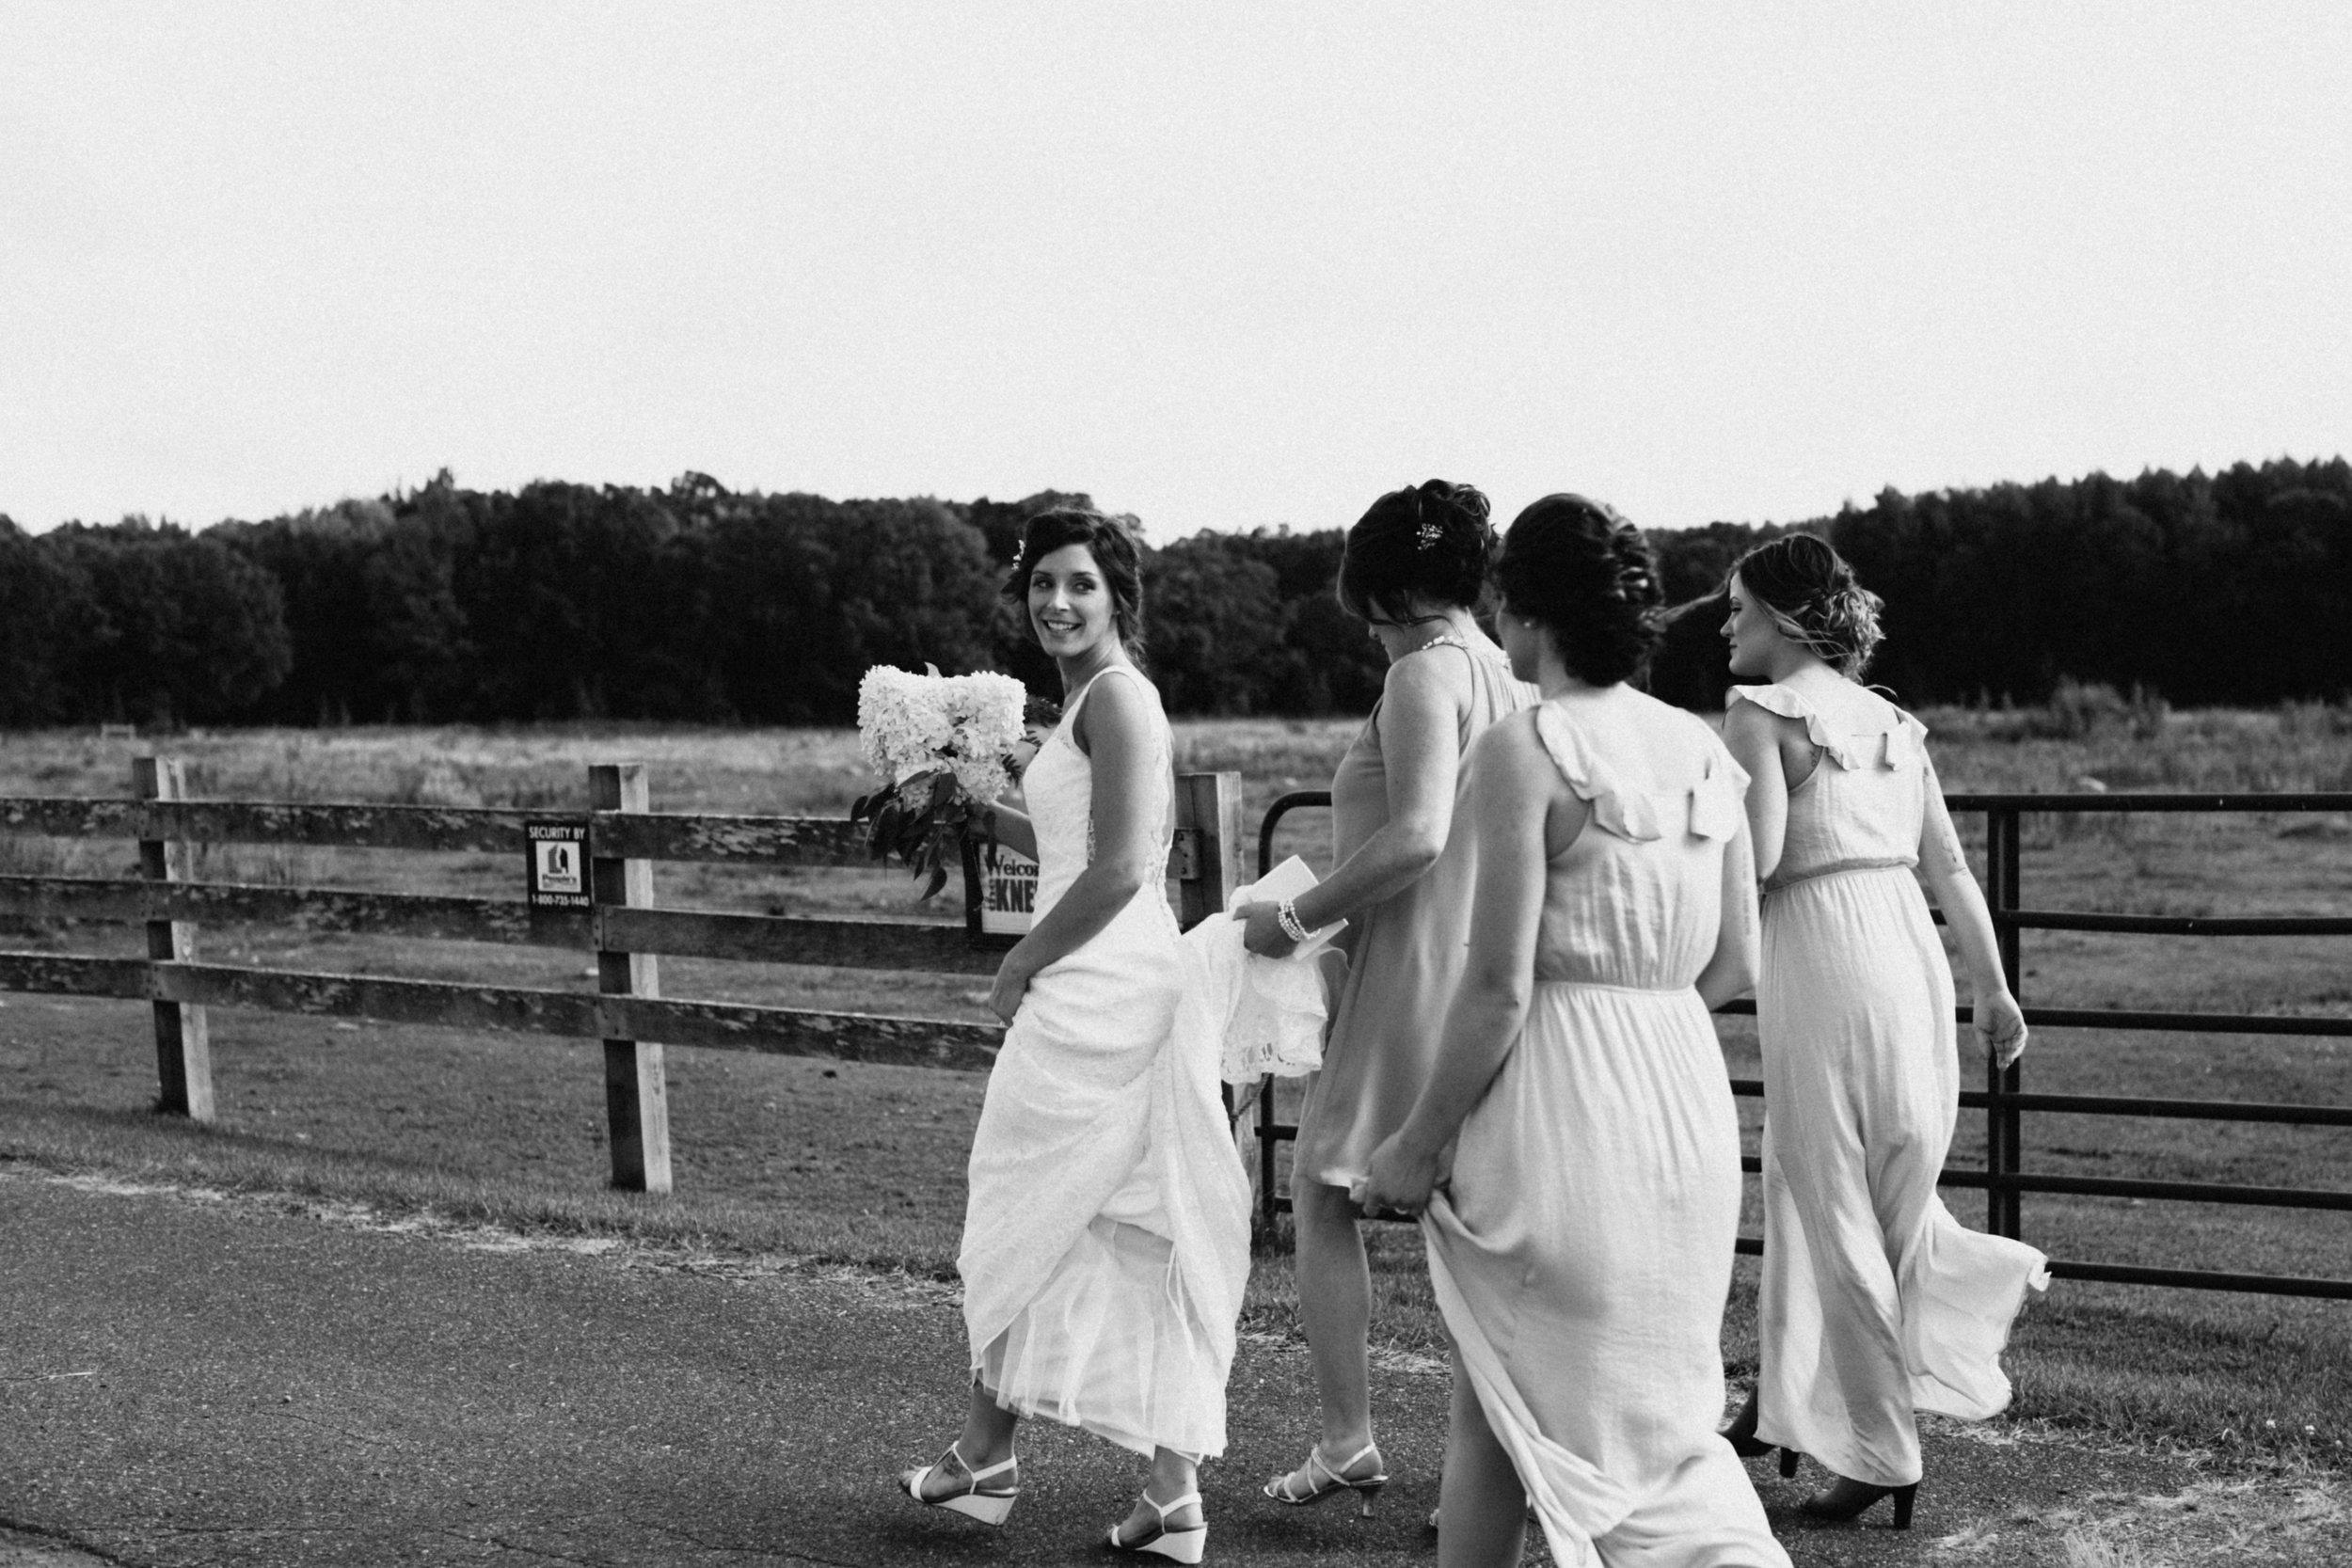 Family farm wedding in Brainerd Minnesota